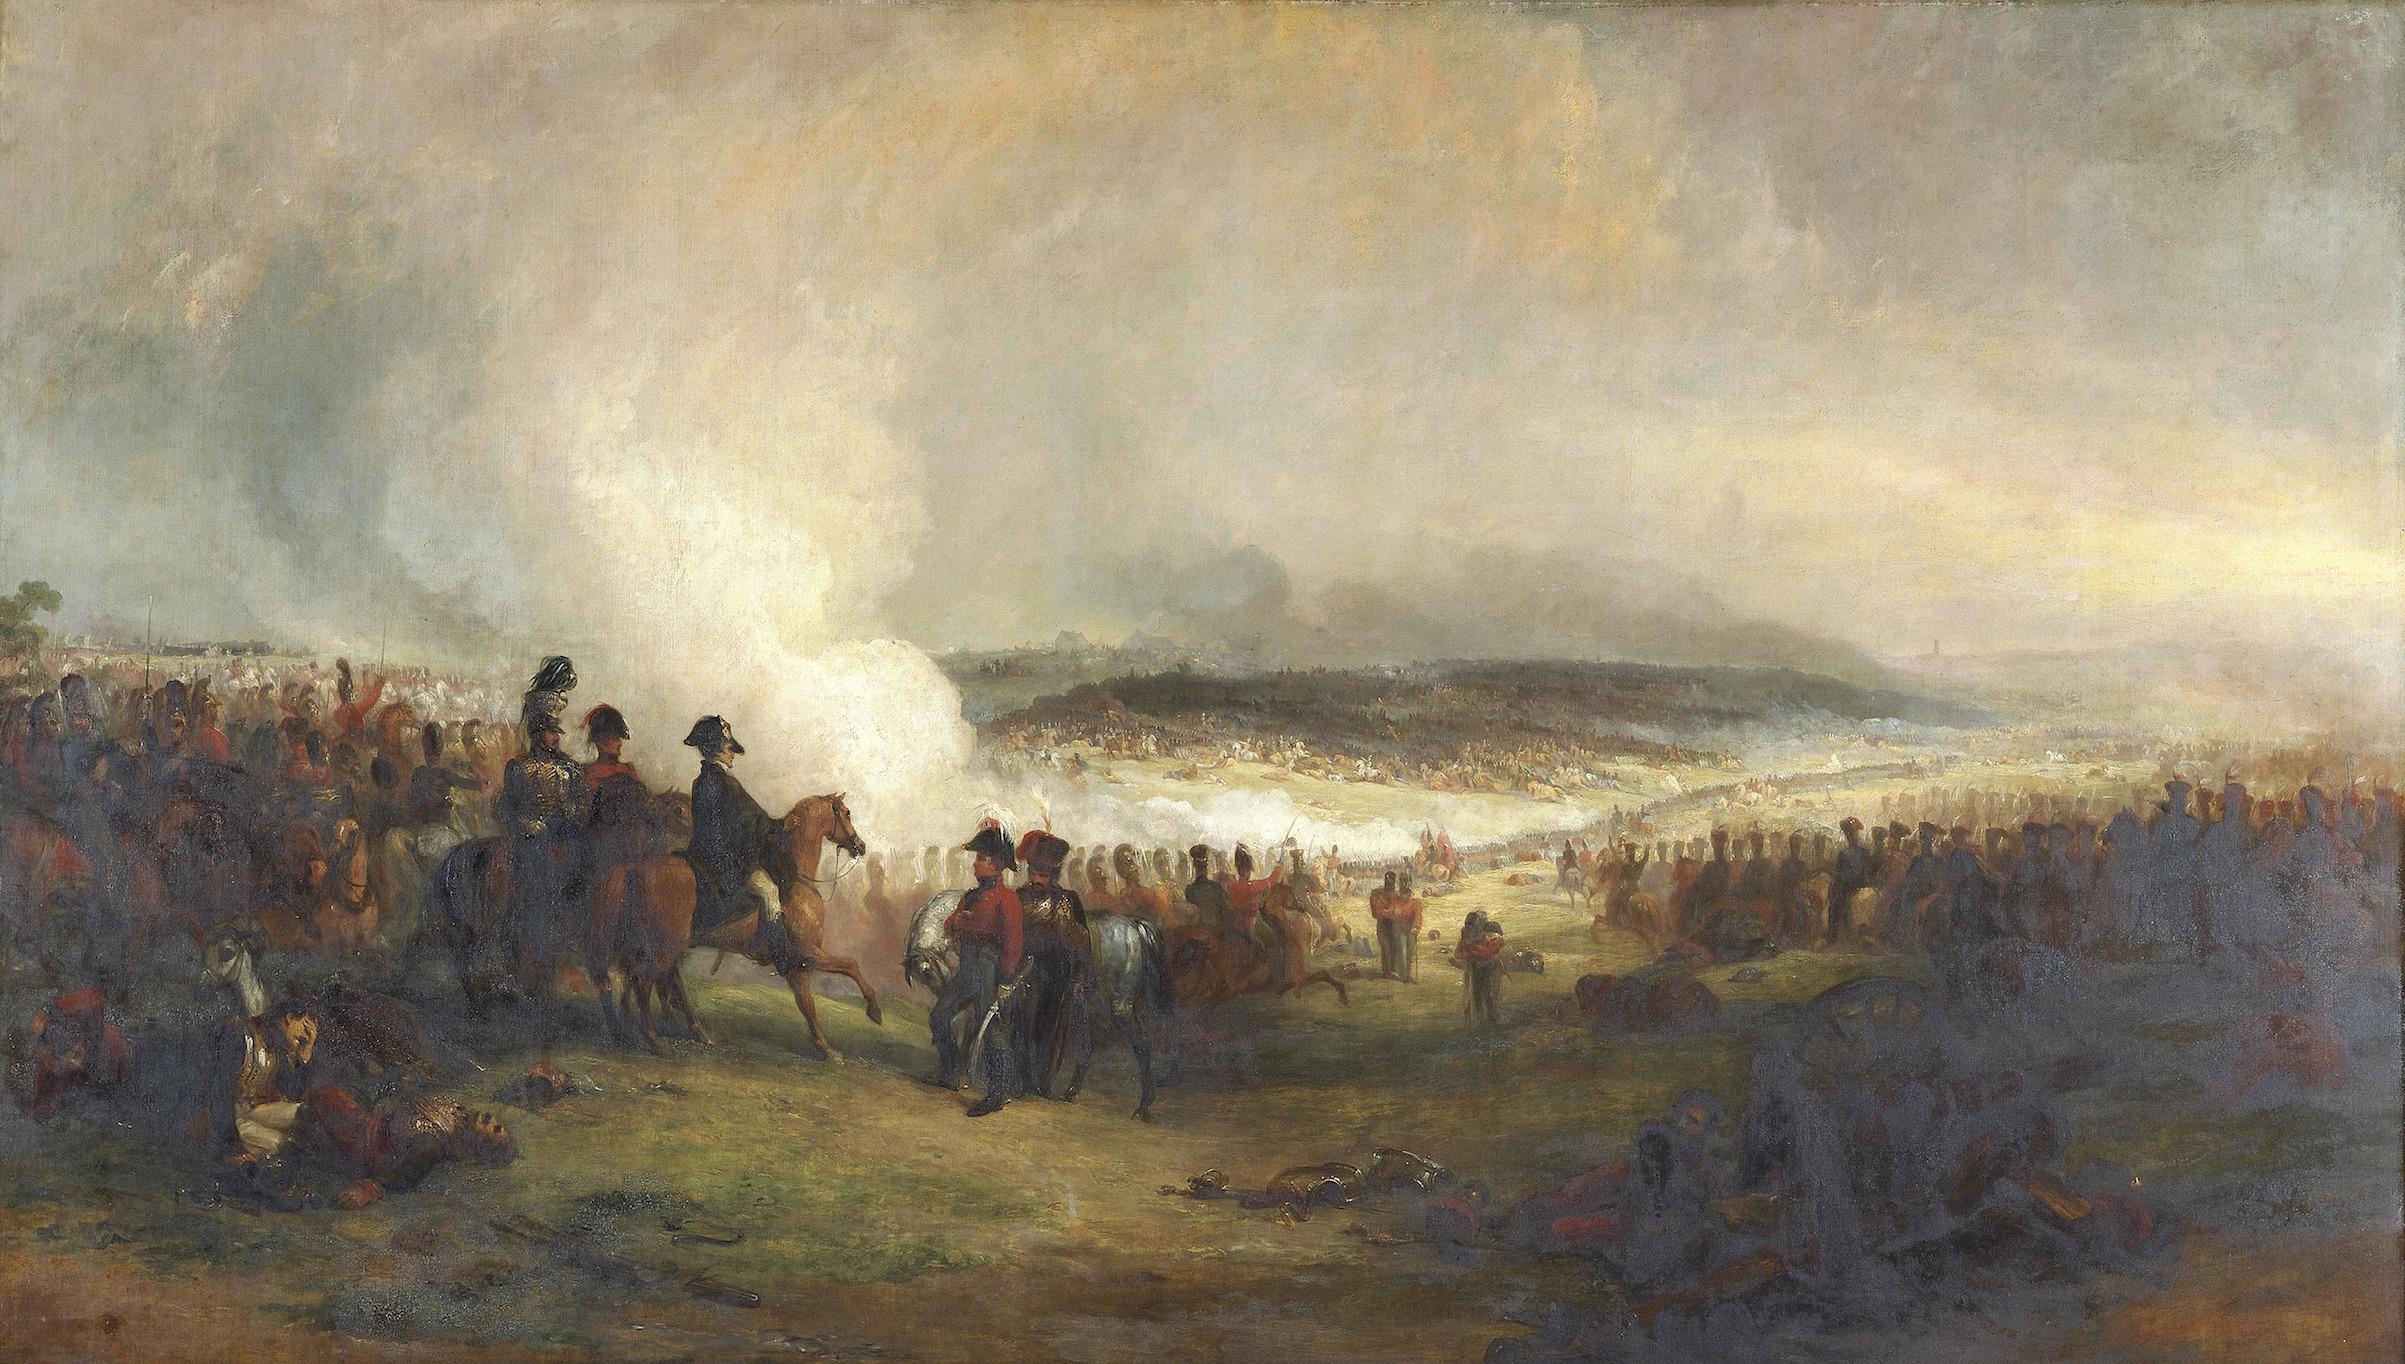 The battle of Waterloo', 1813-1869. Artist: George Jones.